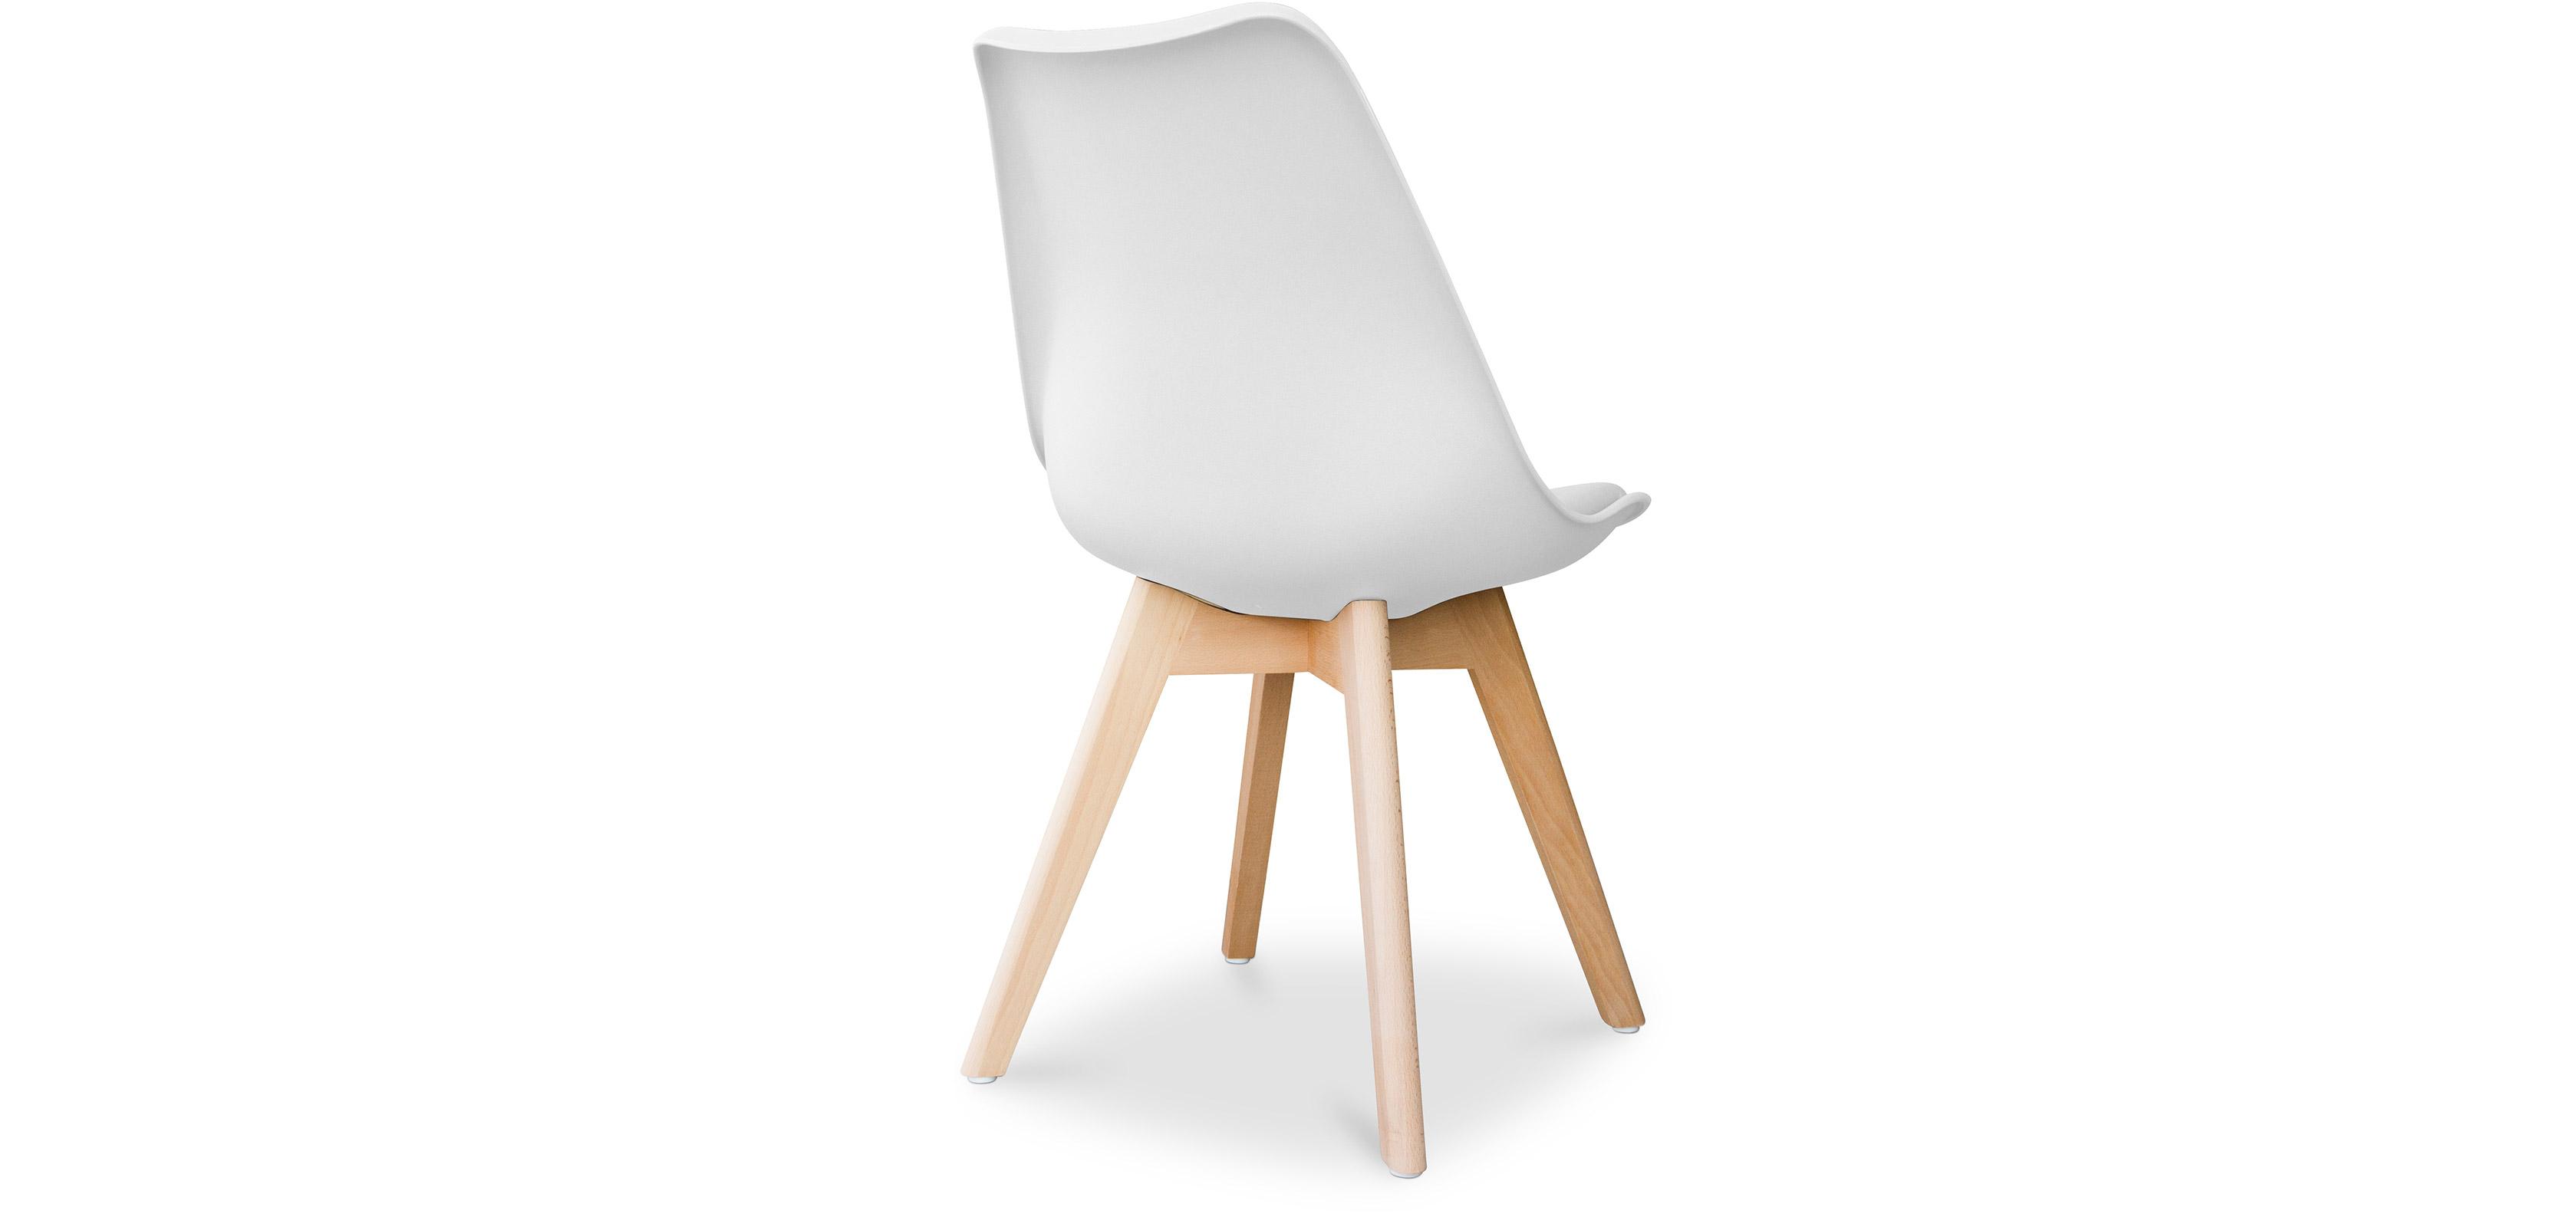 geneva stuhl mit kissen skandinavisches design kunststoff. Black Bedroom Furniture Sets. Home Design Ideas